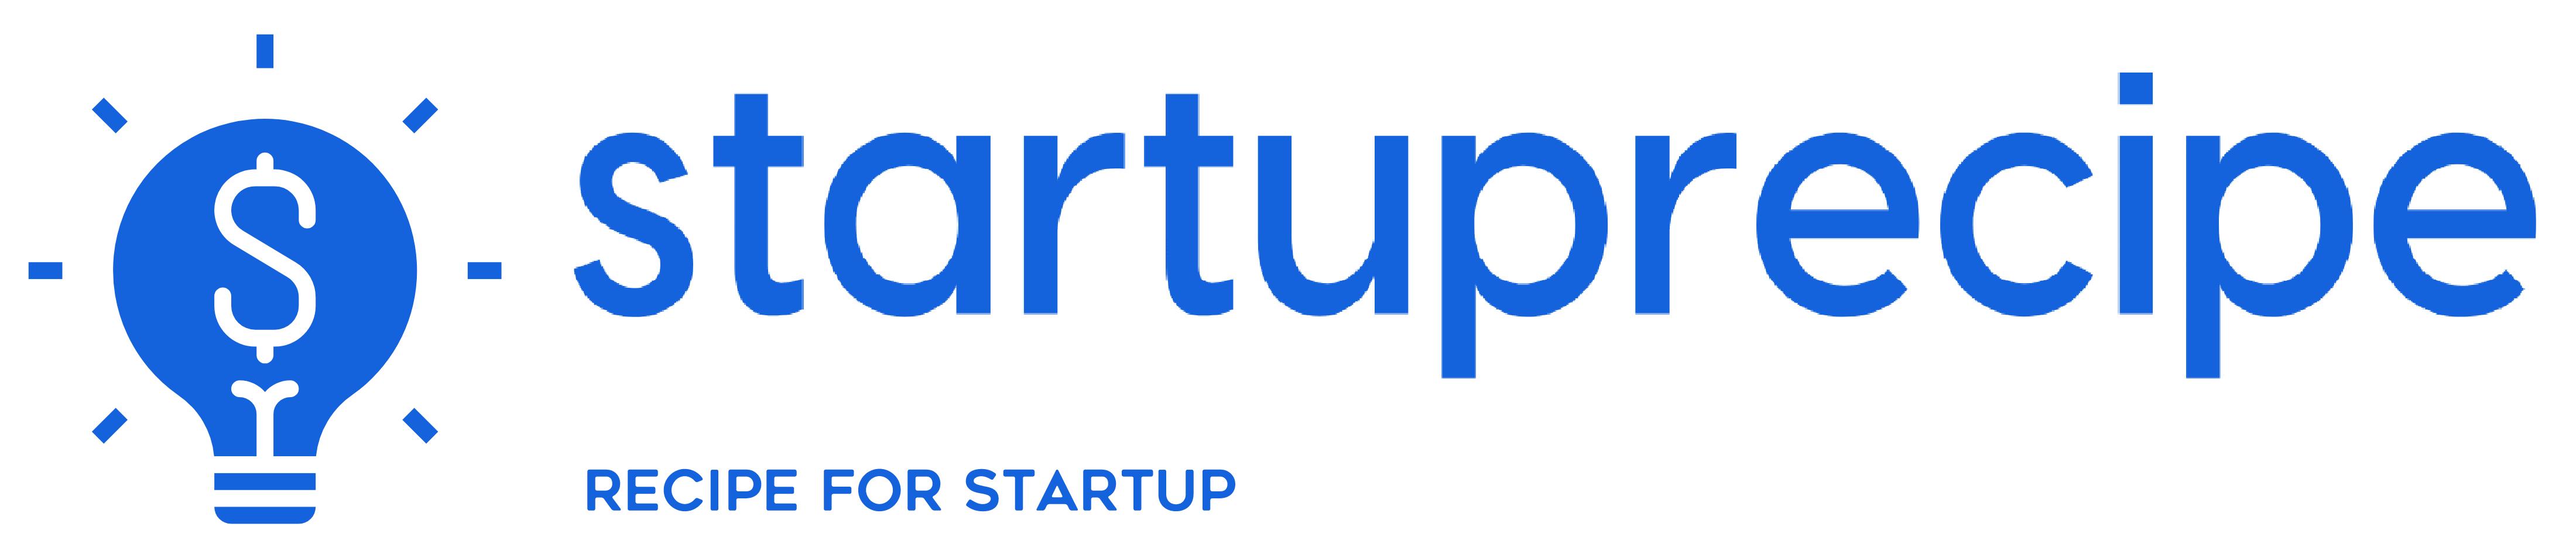 startuprecipe